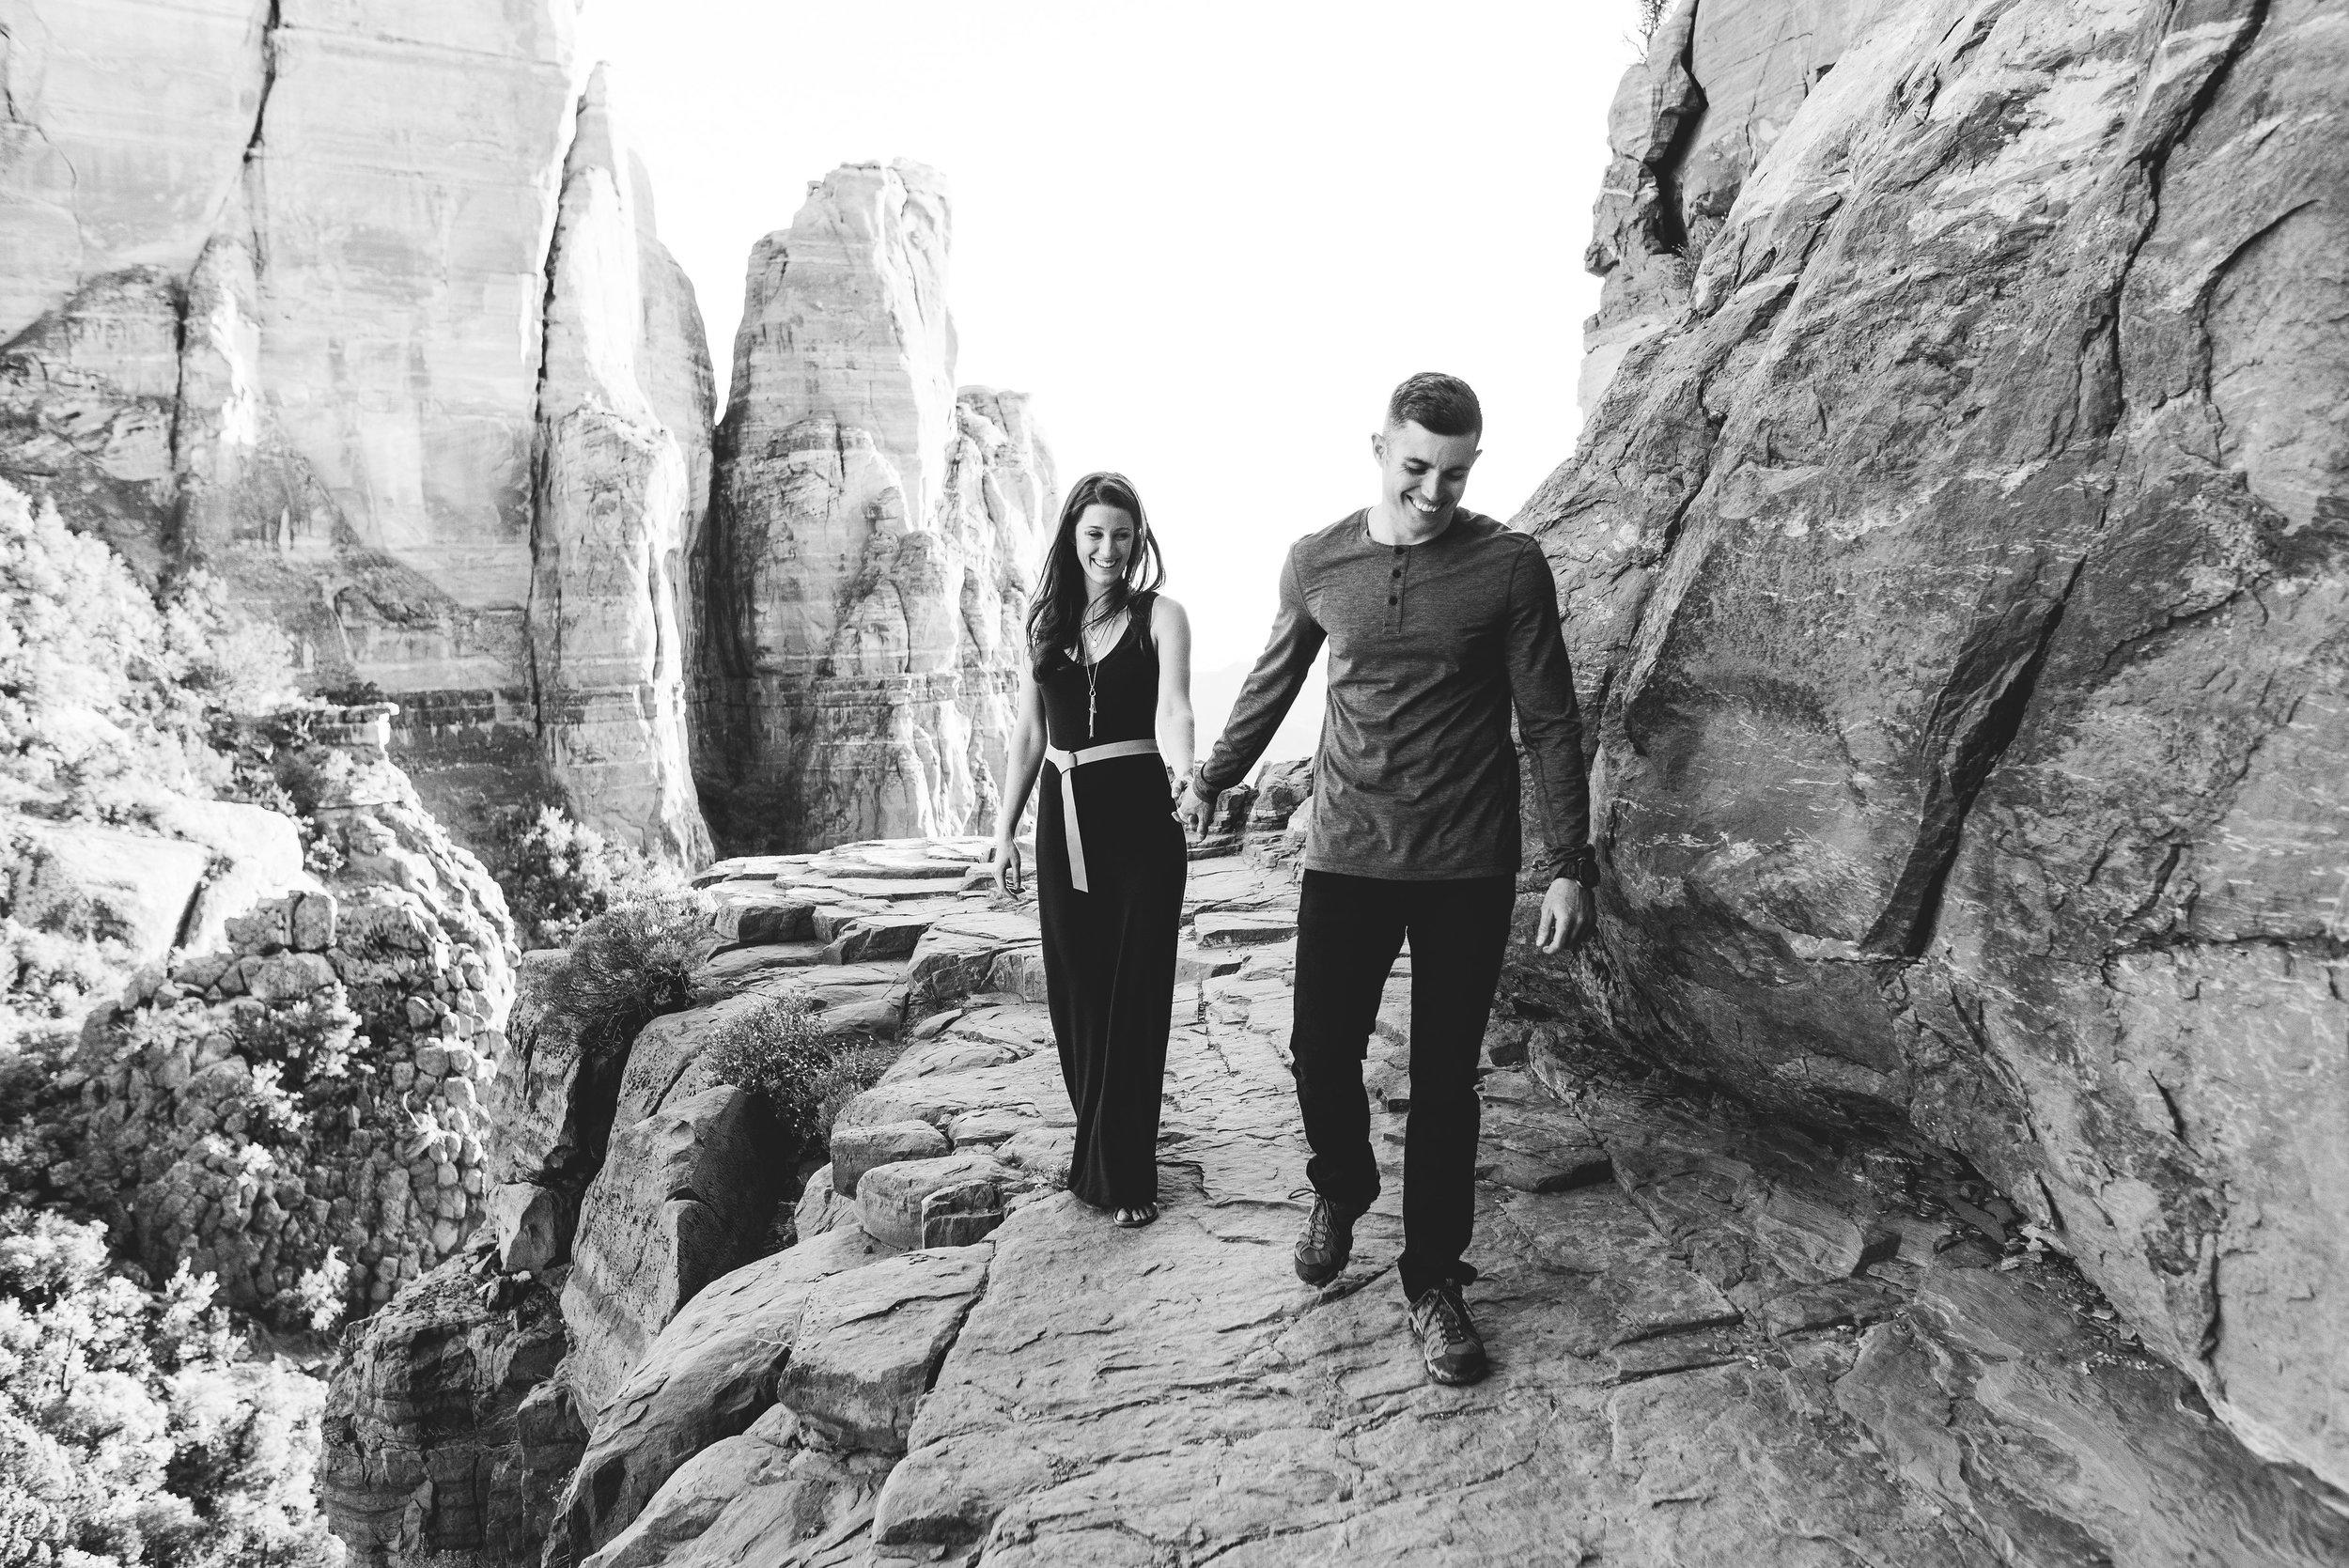 Isaiah-&-Taylor-Photography---Paul-&-Karen-Engagement,-Sedona-Arizona-117.jpg